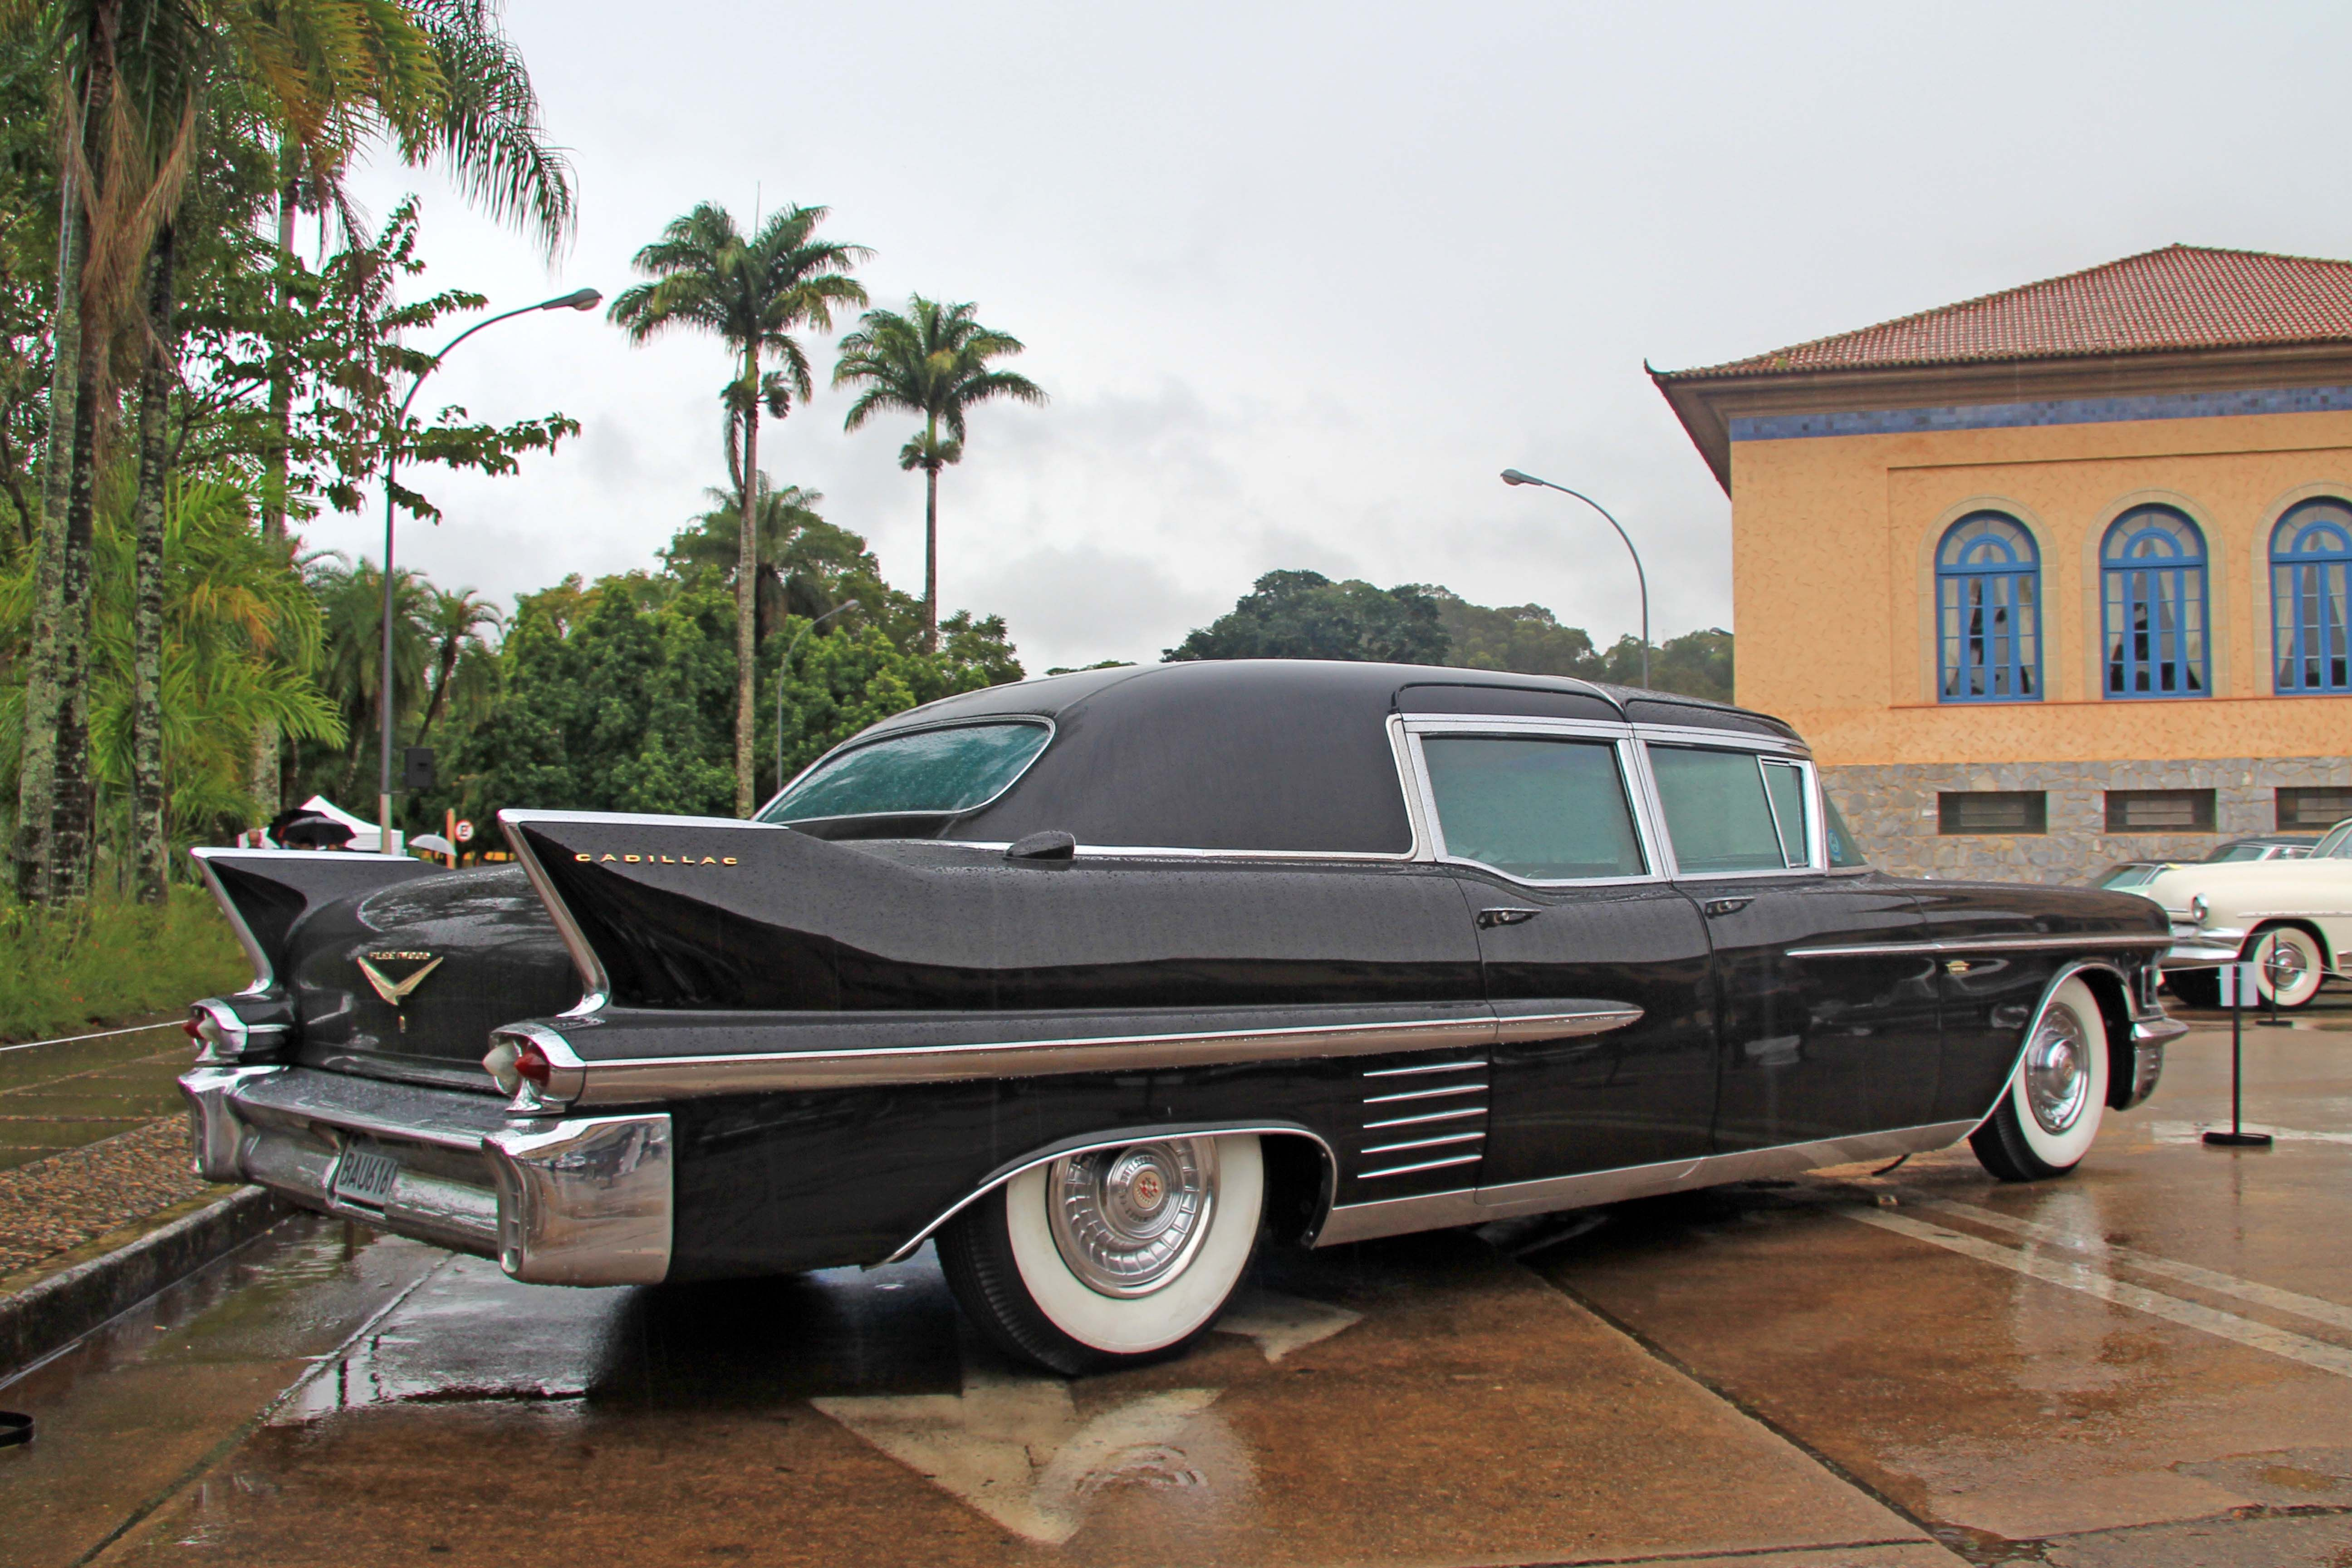 1958 cadillac fleetwood limousine cadillac 1957 58 pinterest cadillac fleetwood cadillac and limo